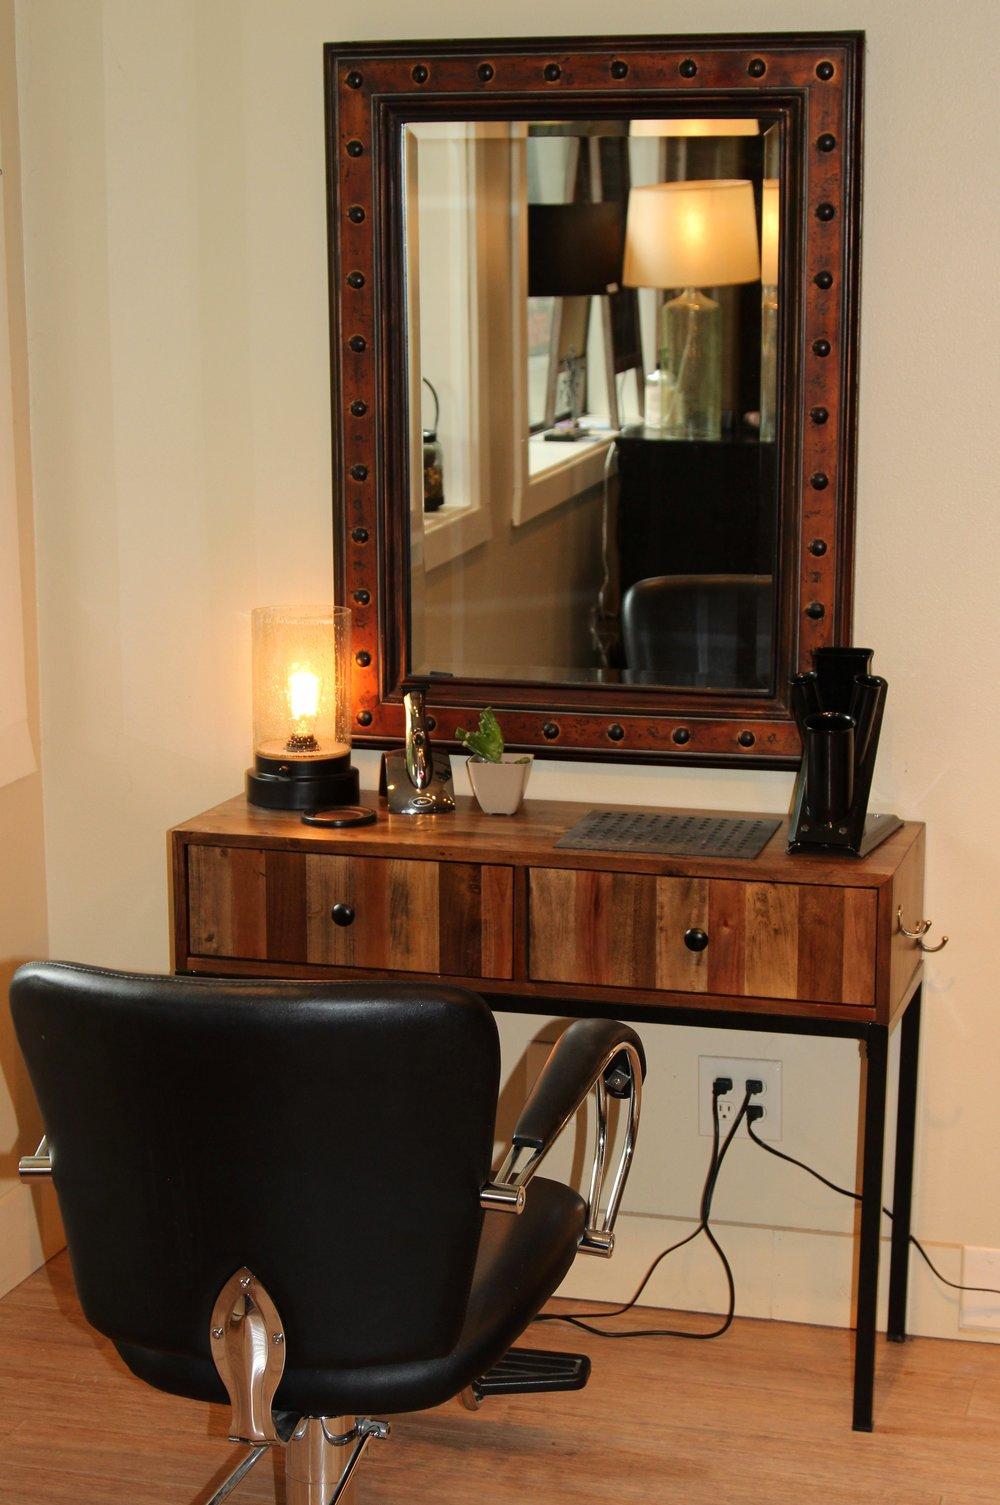 Balance-Salon-Spa-Hair-Salons-Jackson-Wyoming